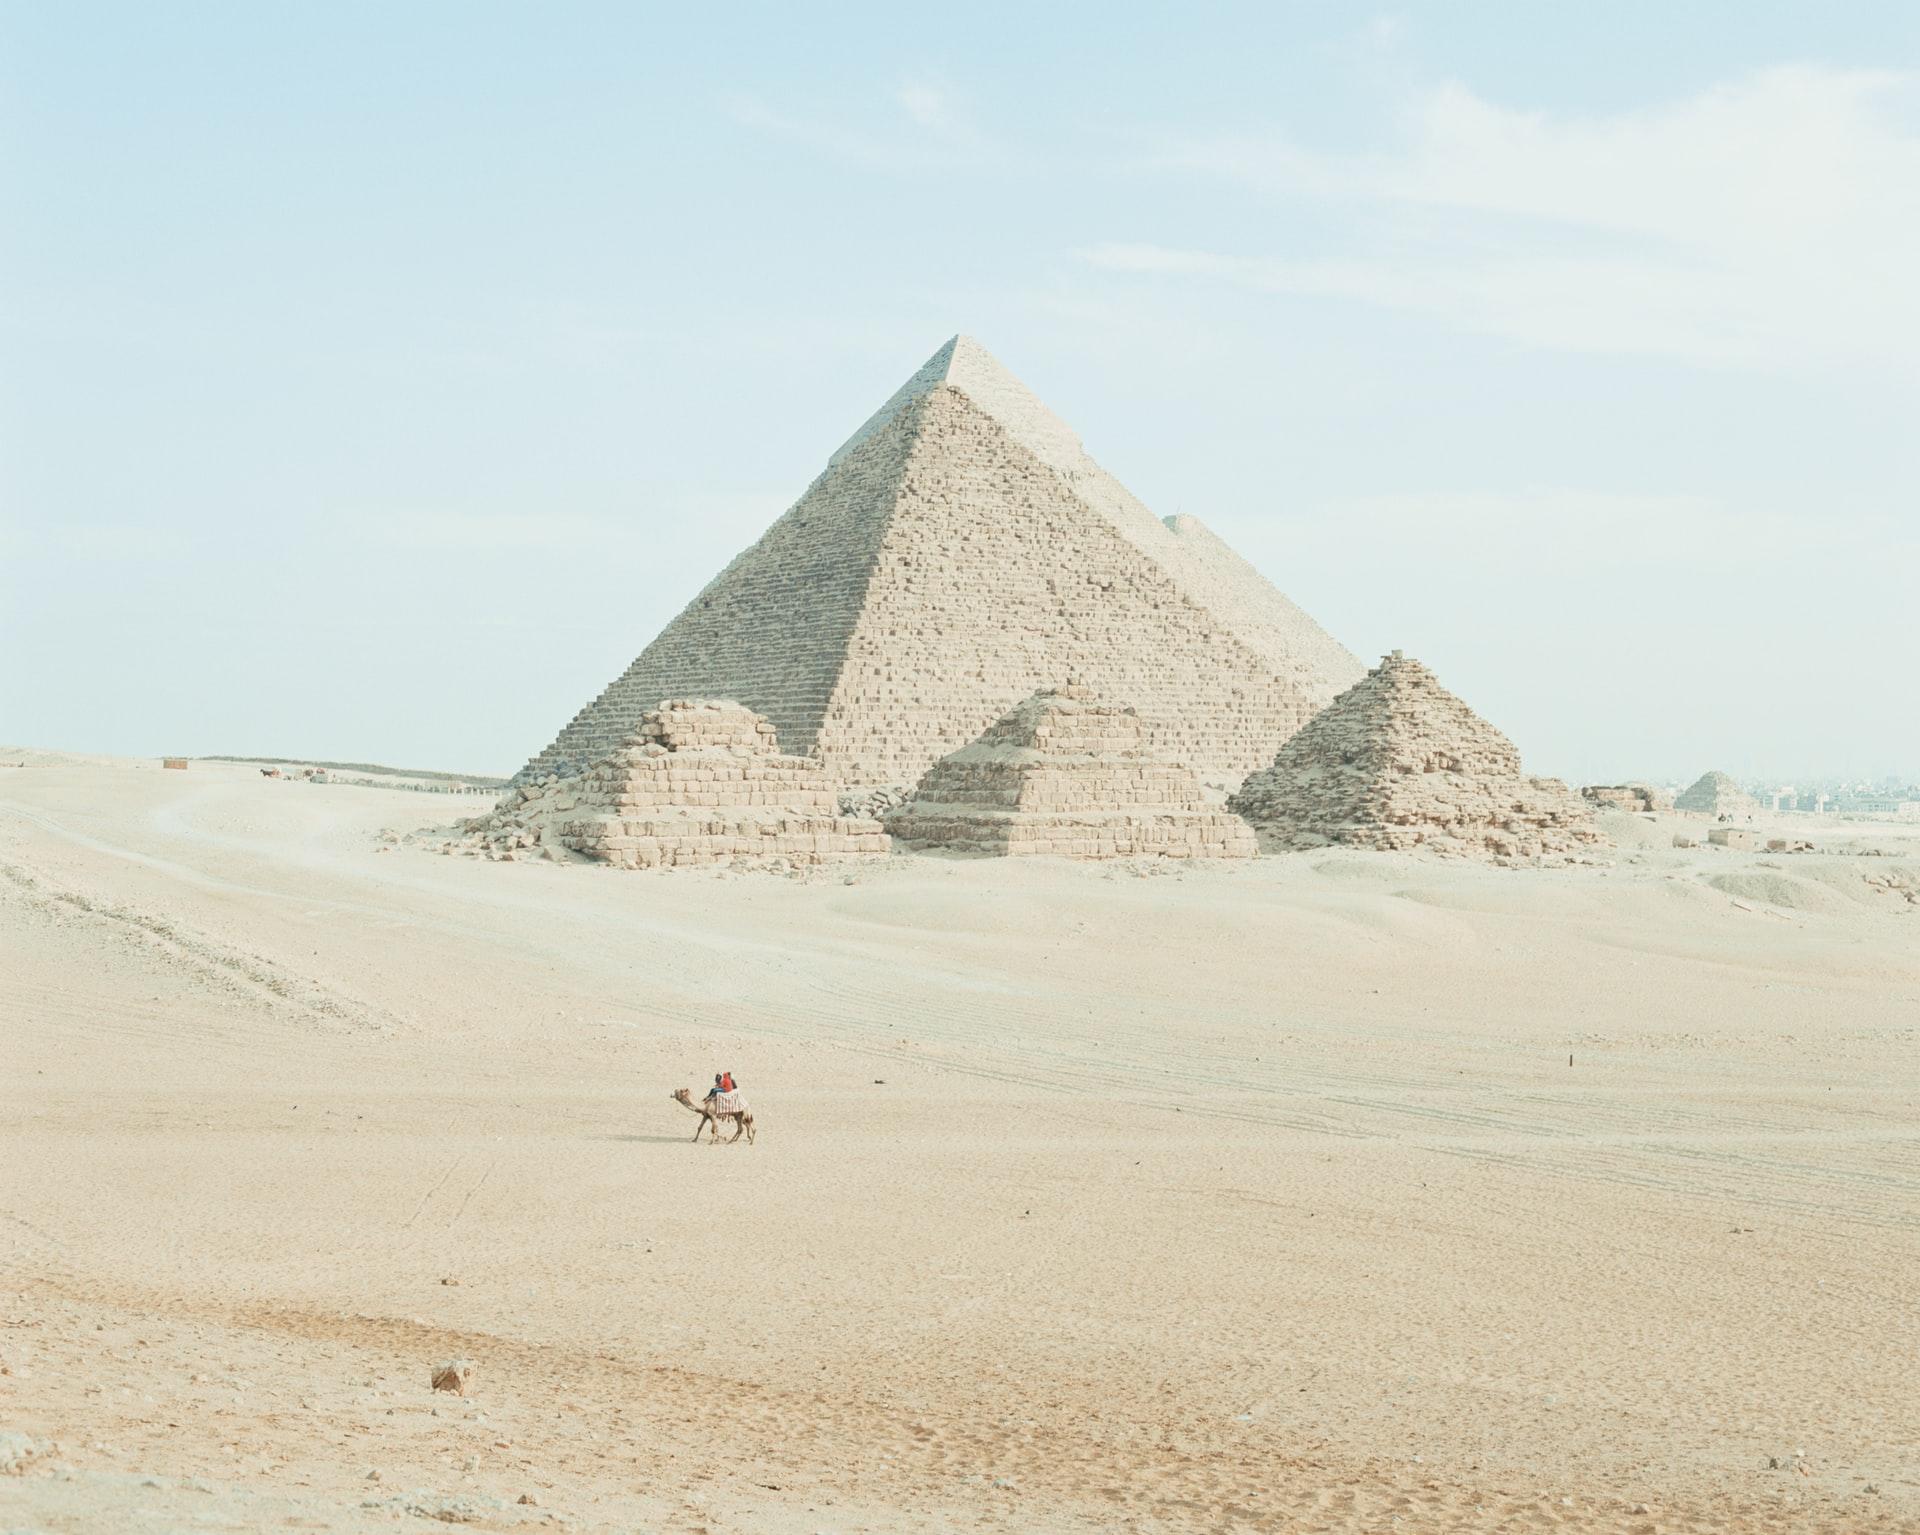 The great pyramids of Giza, Cairo, Egypt